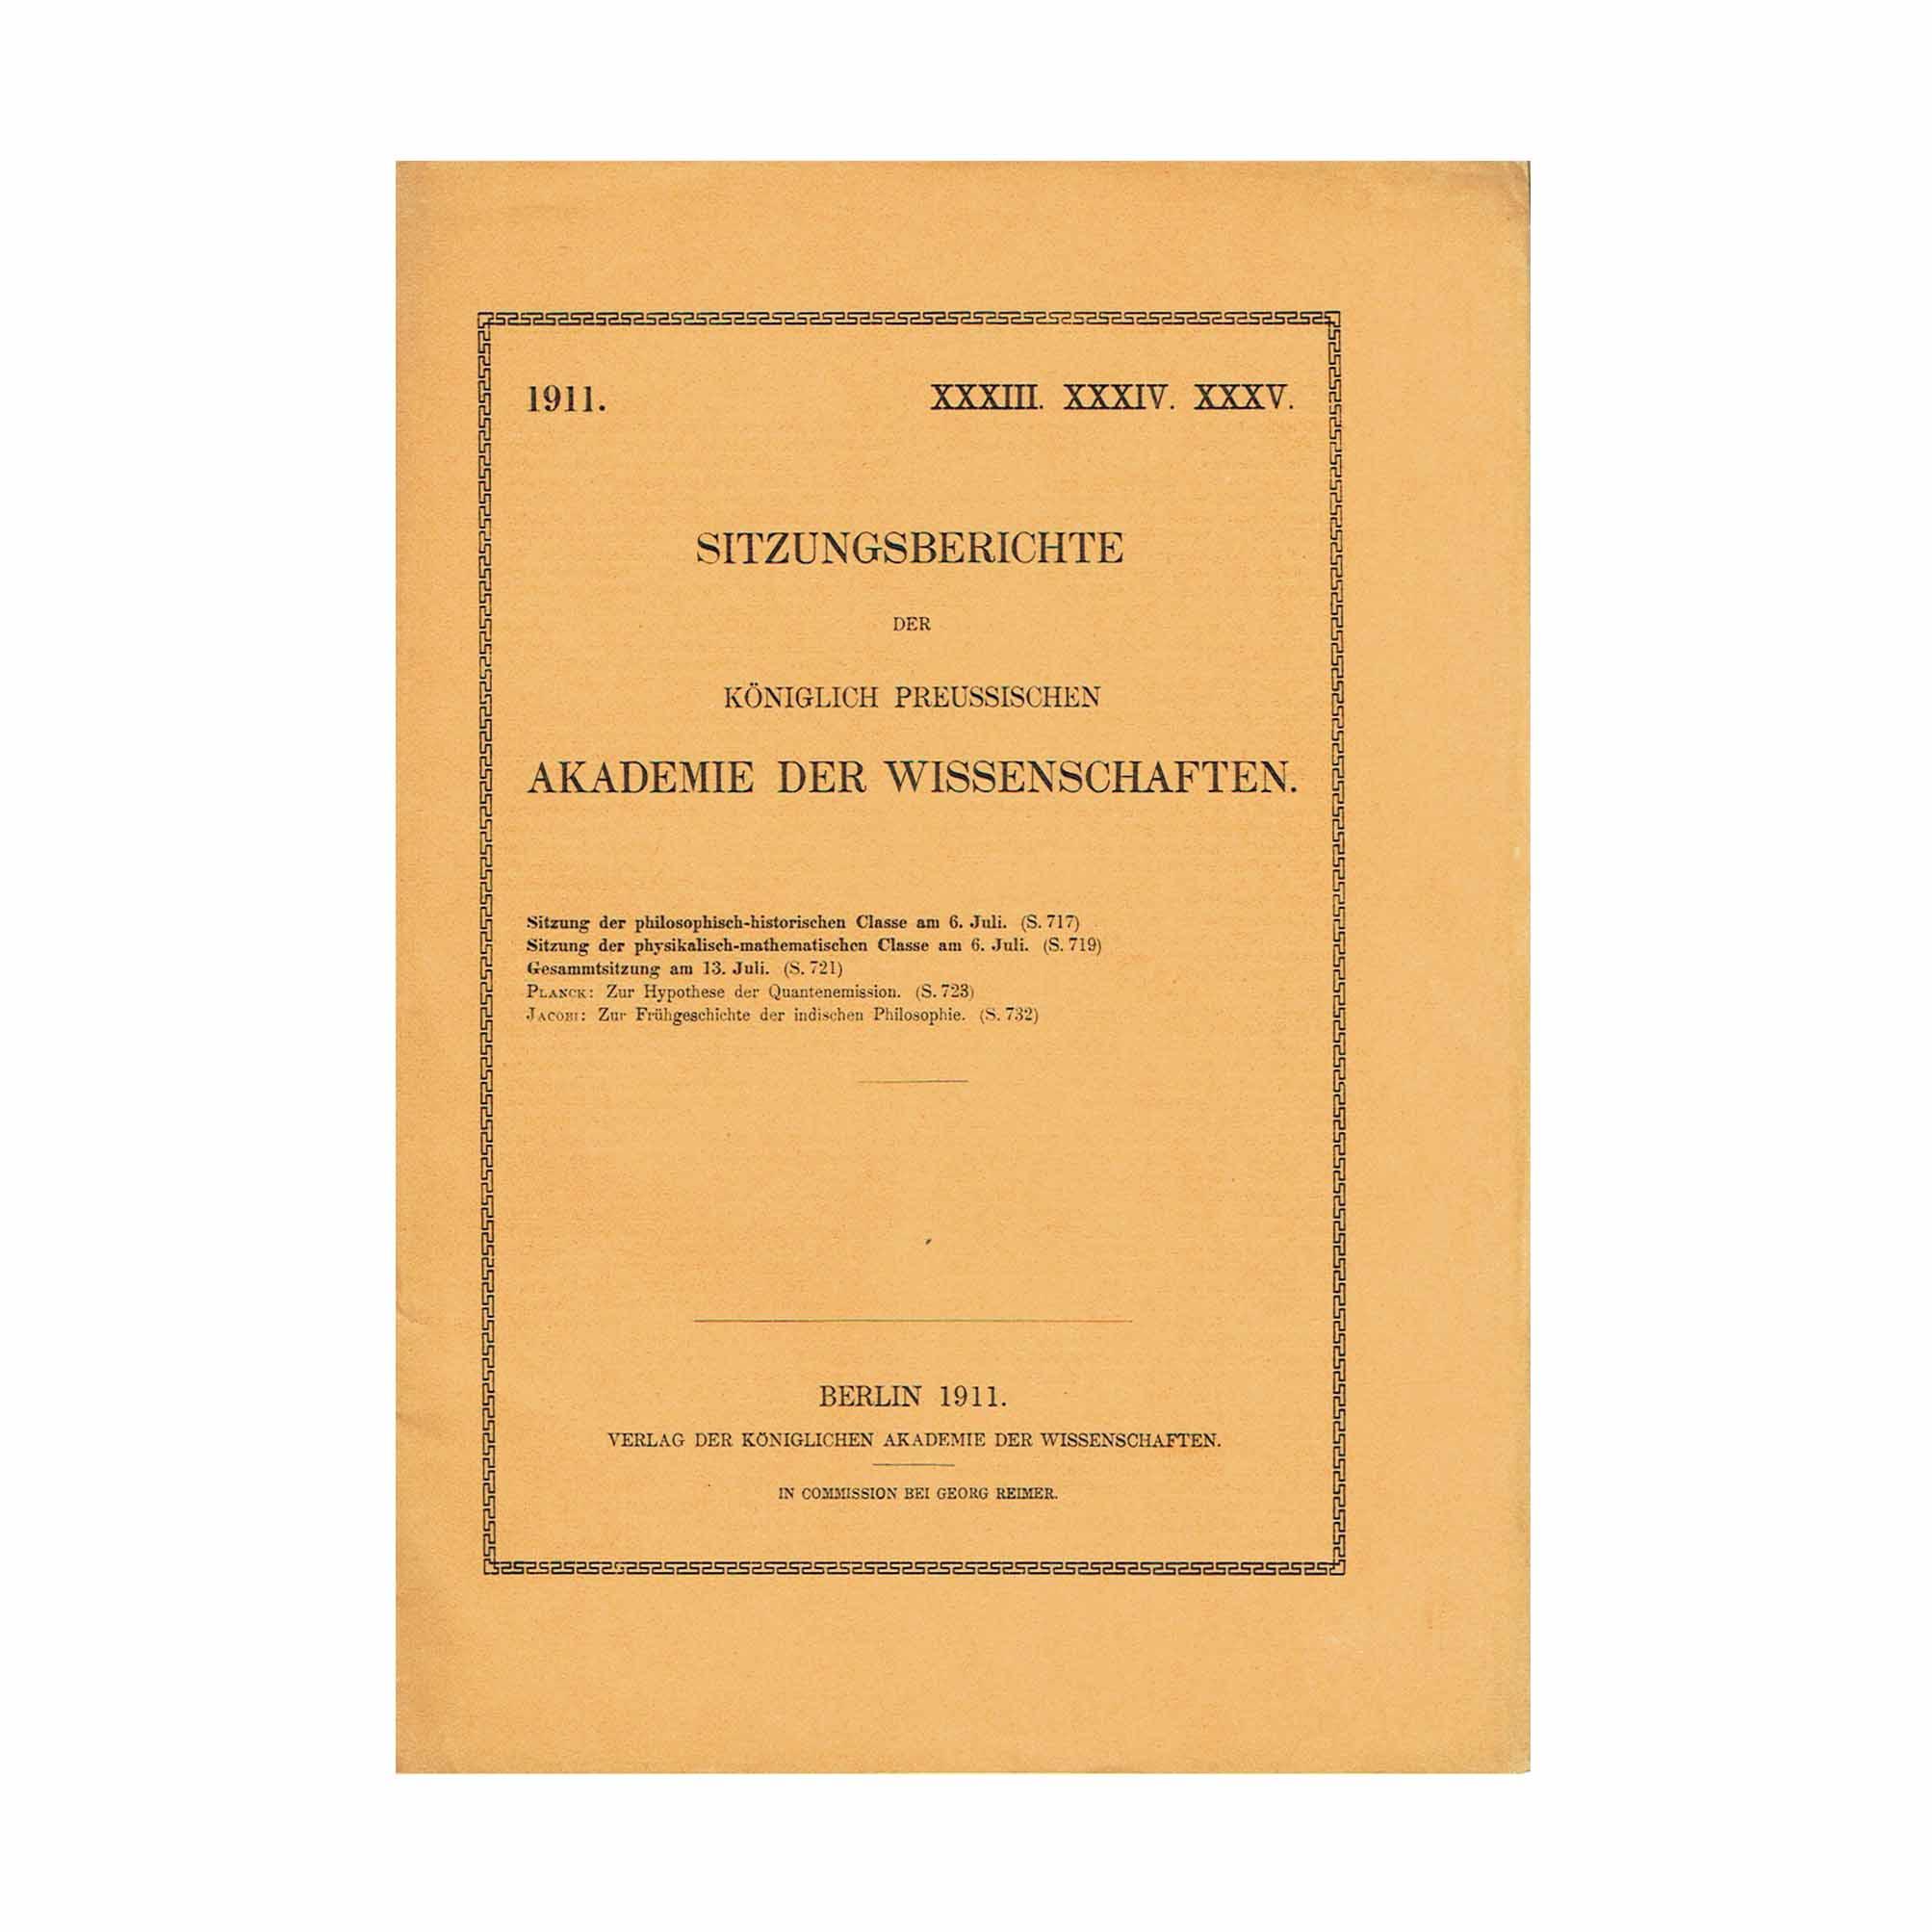 5888K-Planck-Hypothese-Quantenemission-1917-Front-Cover-N-Kopie.jpeg